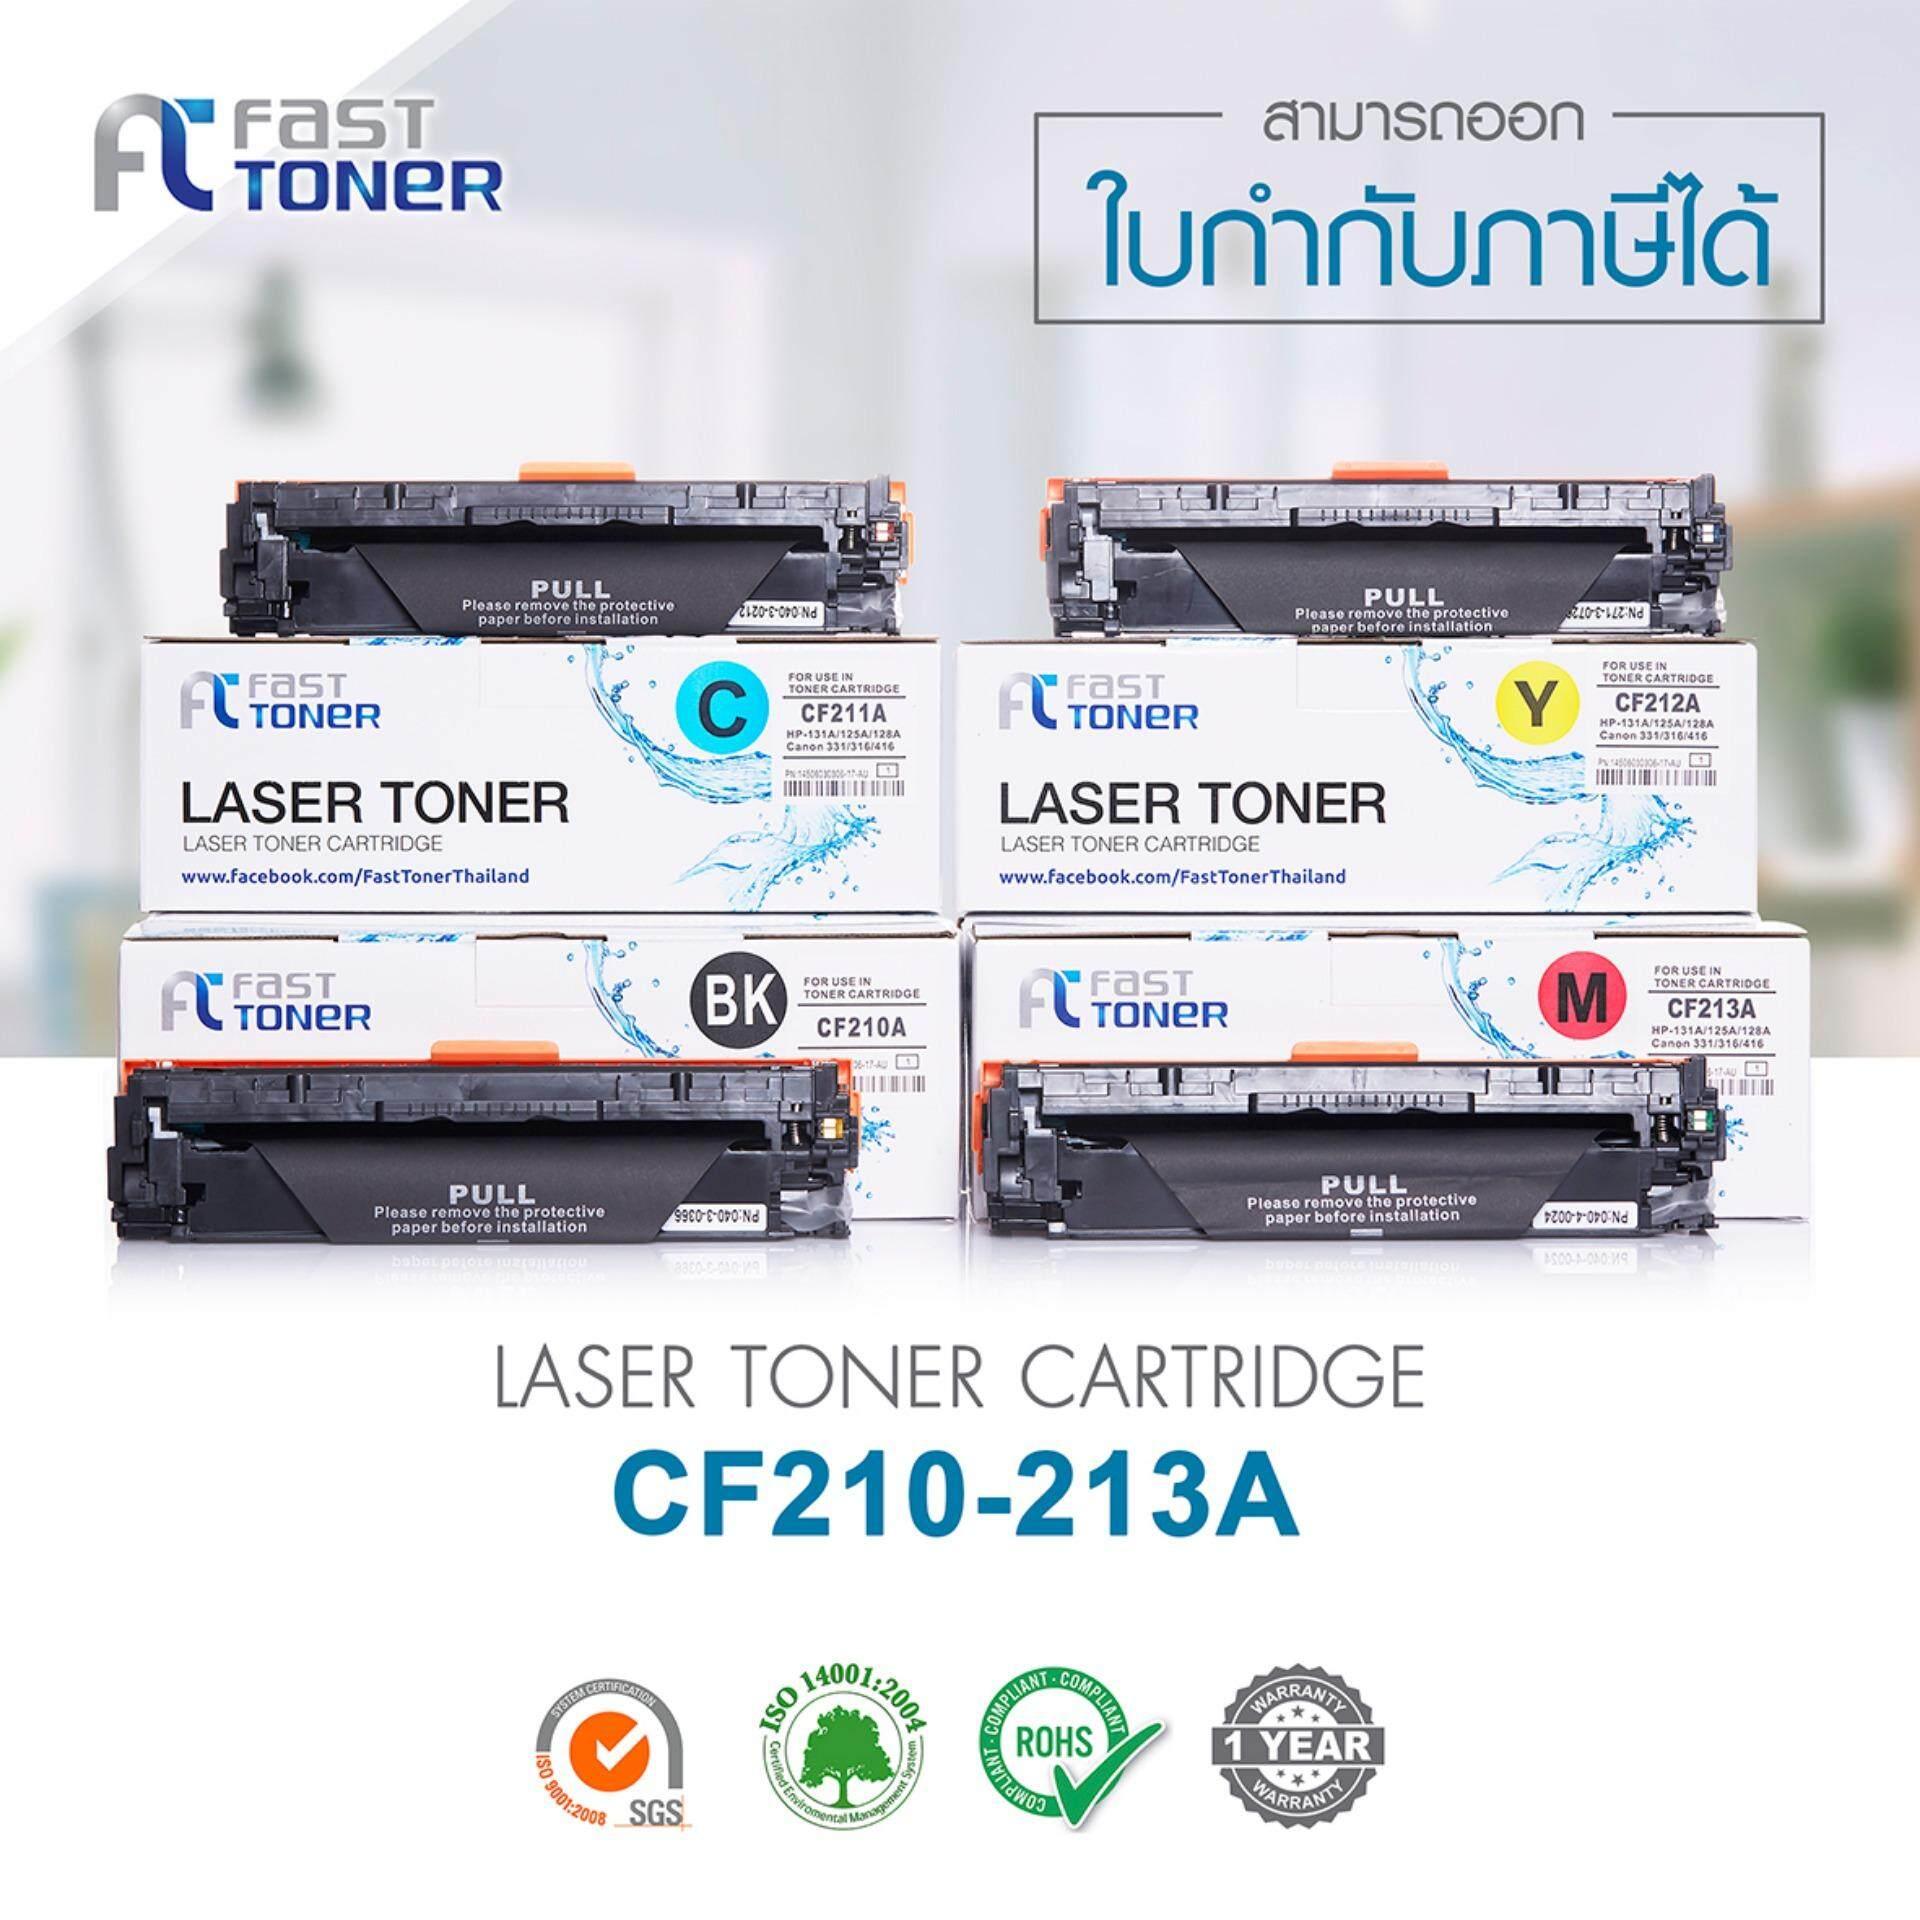 Fast Toner ตลับหมึกเทียบเท่า CANON Cartridge-331/316/416 HP 131A/125A/128A (CF210A/CF211A/CF212A/CF213A) 4สี สำหรับปริ้นเตอร์รุ่น HP LaserJet Pro 200 color M251nw/ M276 Canon Laser Shot LBP 7100/7110 Canon i-Sensys MF 8230 Canon i-Sensys MF 8280